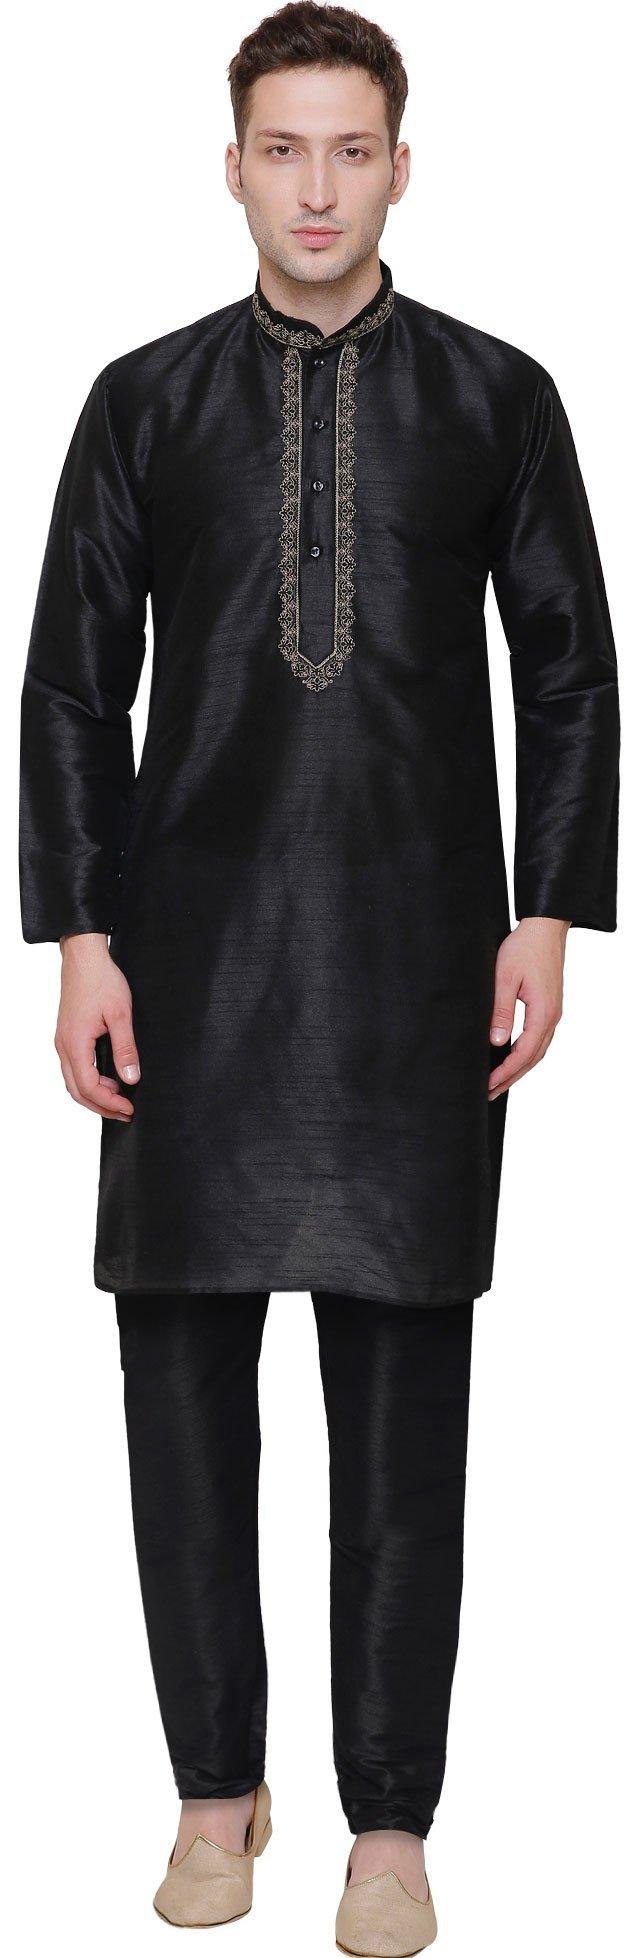 Party Wear Dupion Silk Mens Kurta Pajama India Clothing (Black, L)